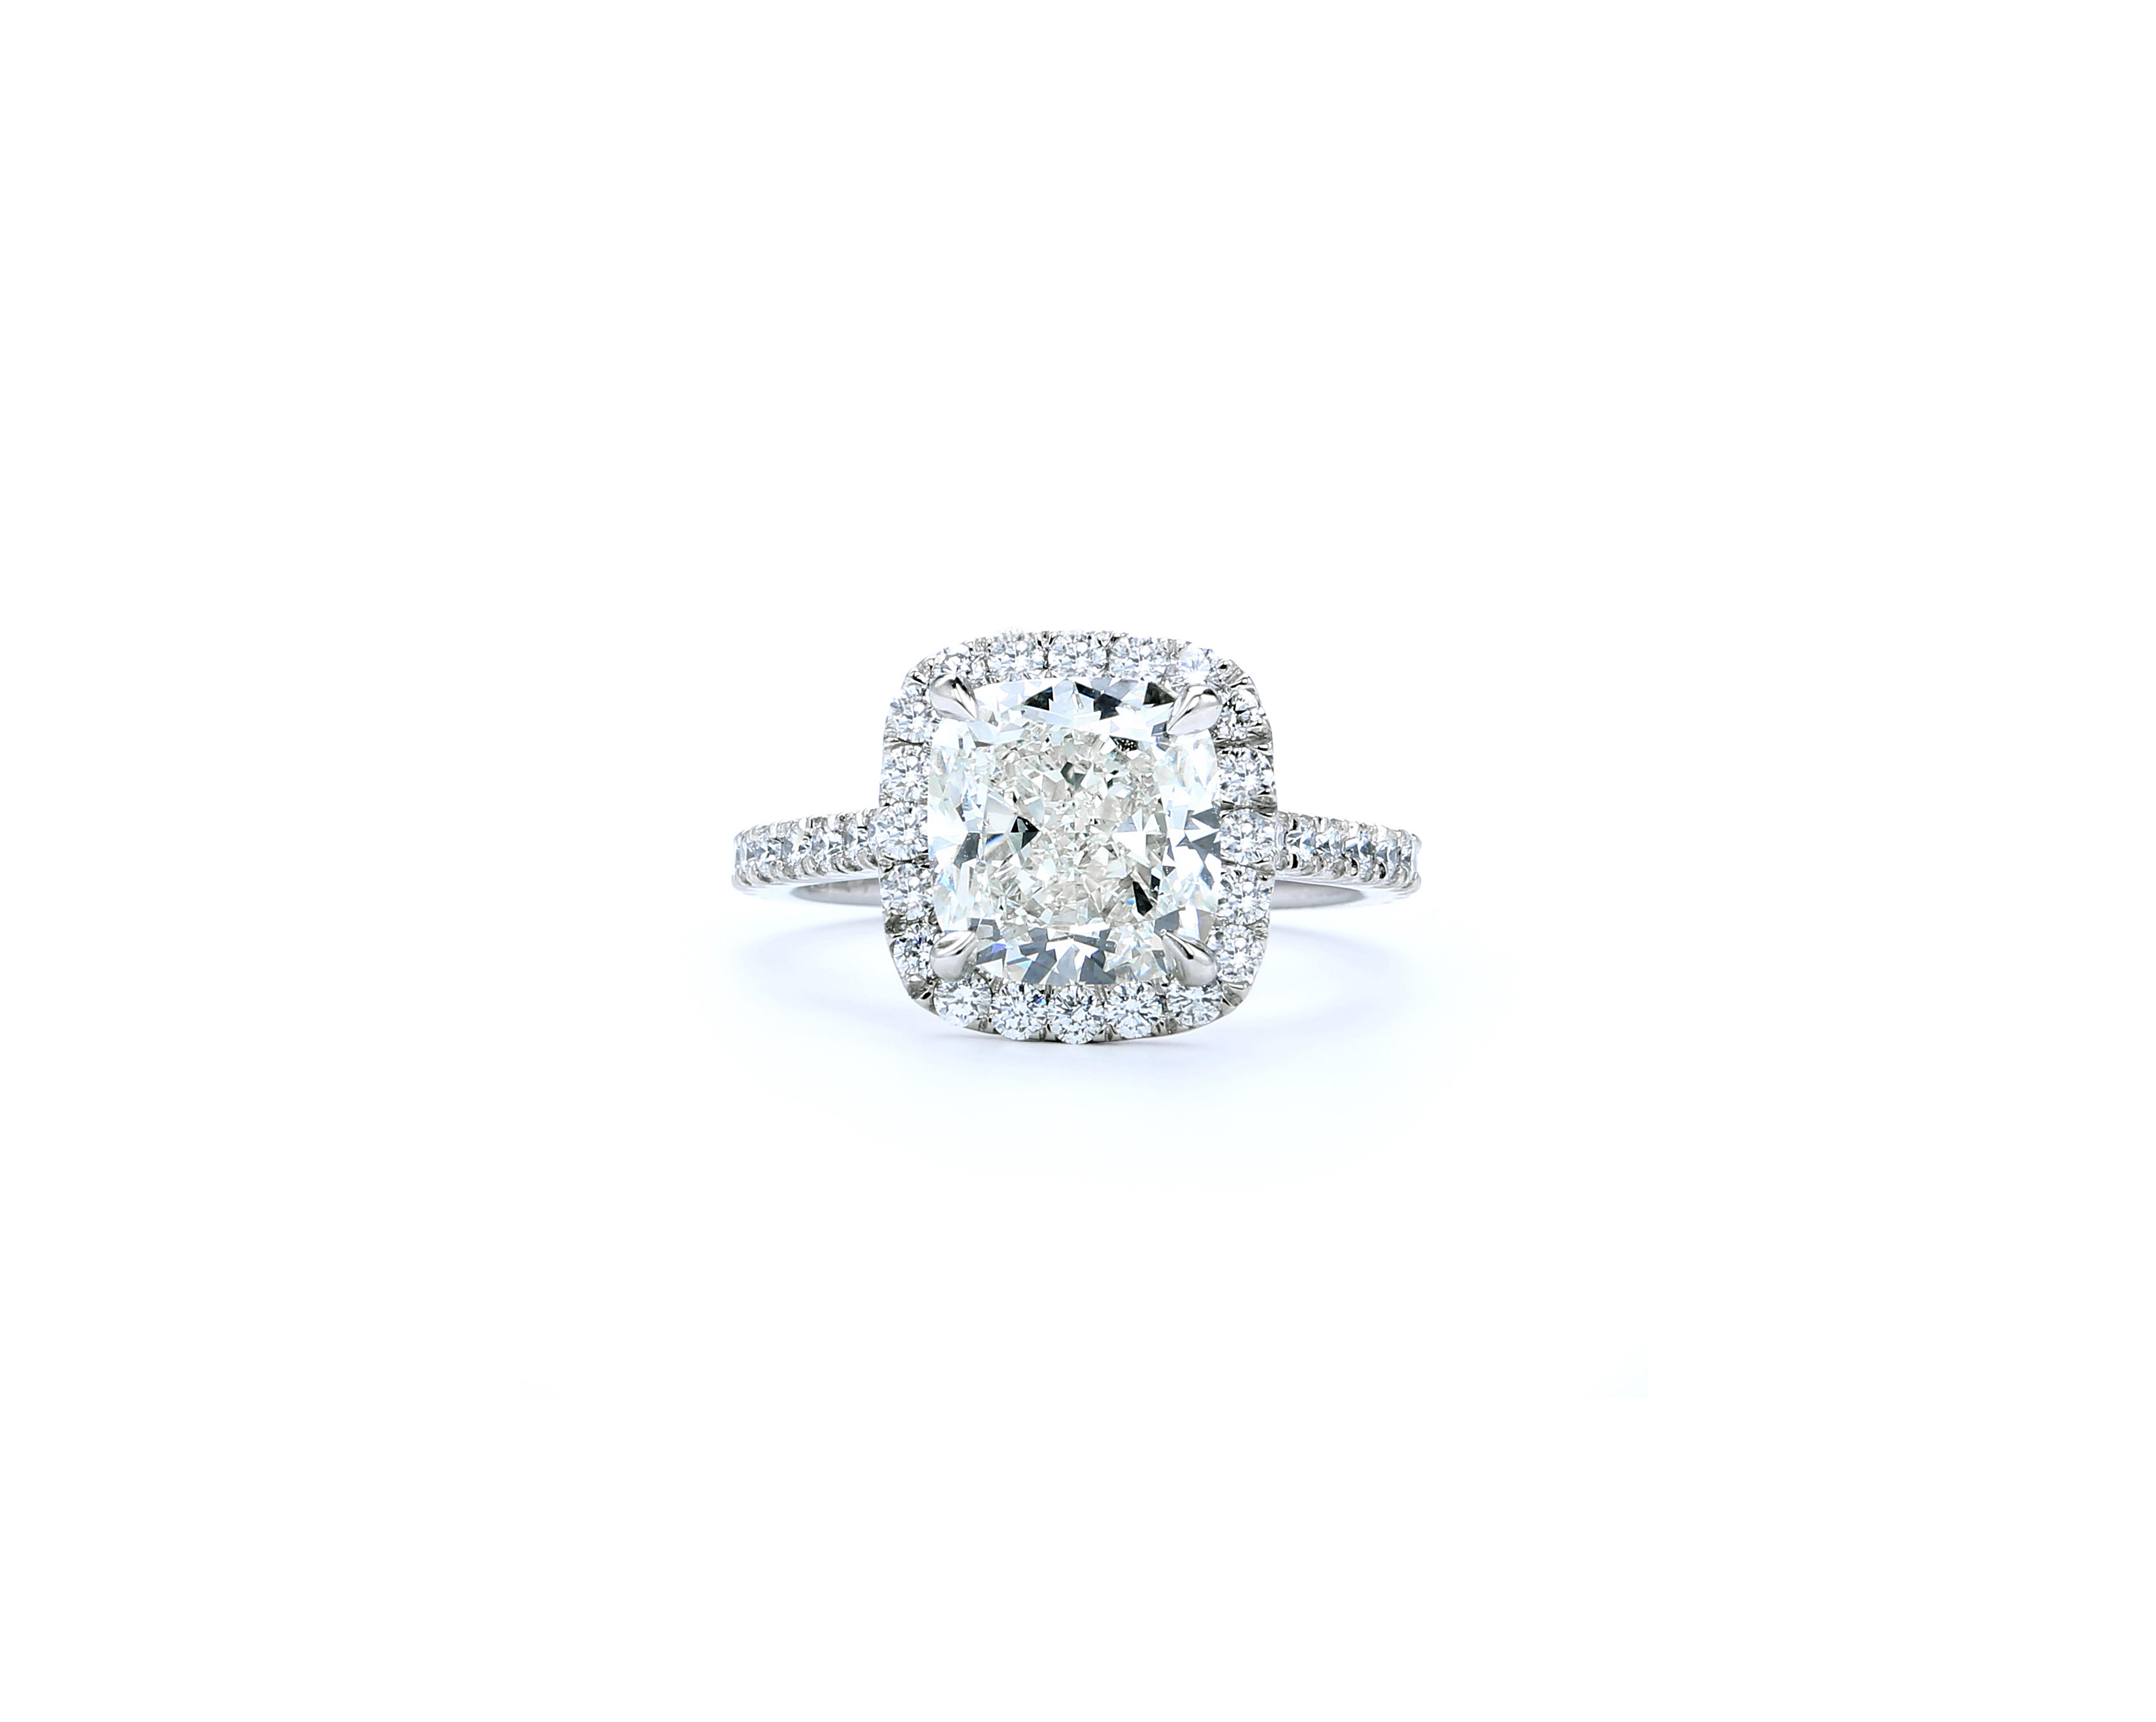 forevermark premier gem cushion cut engagement ring in white gold